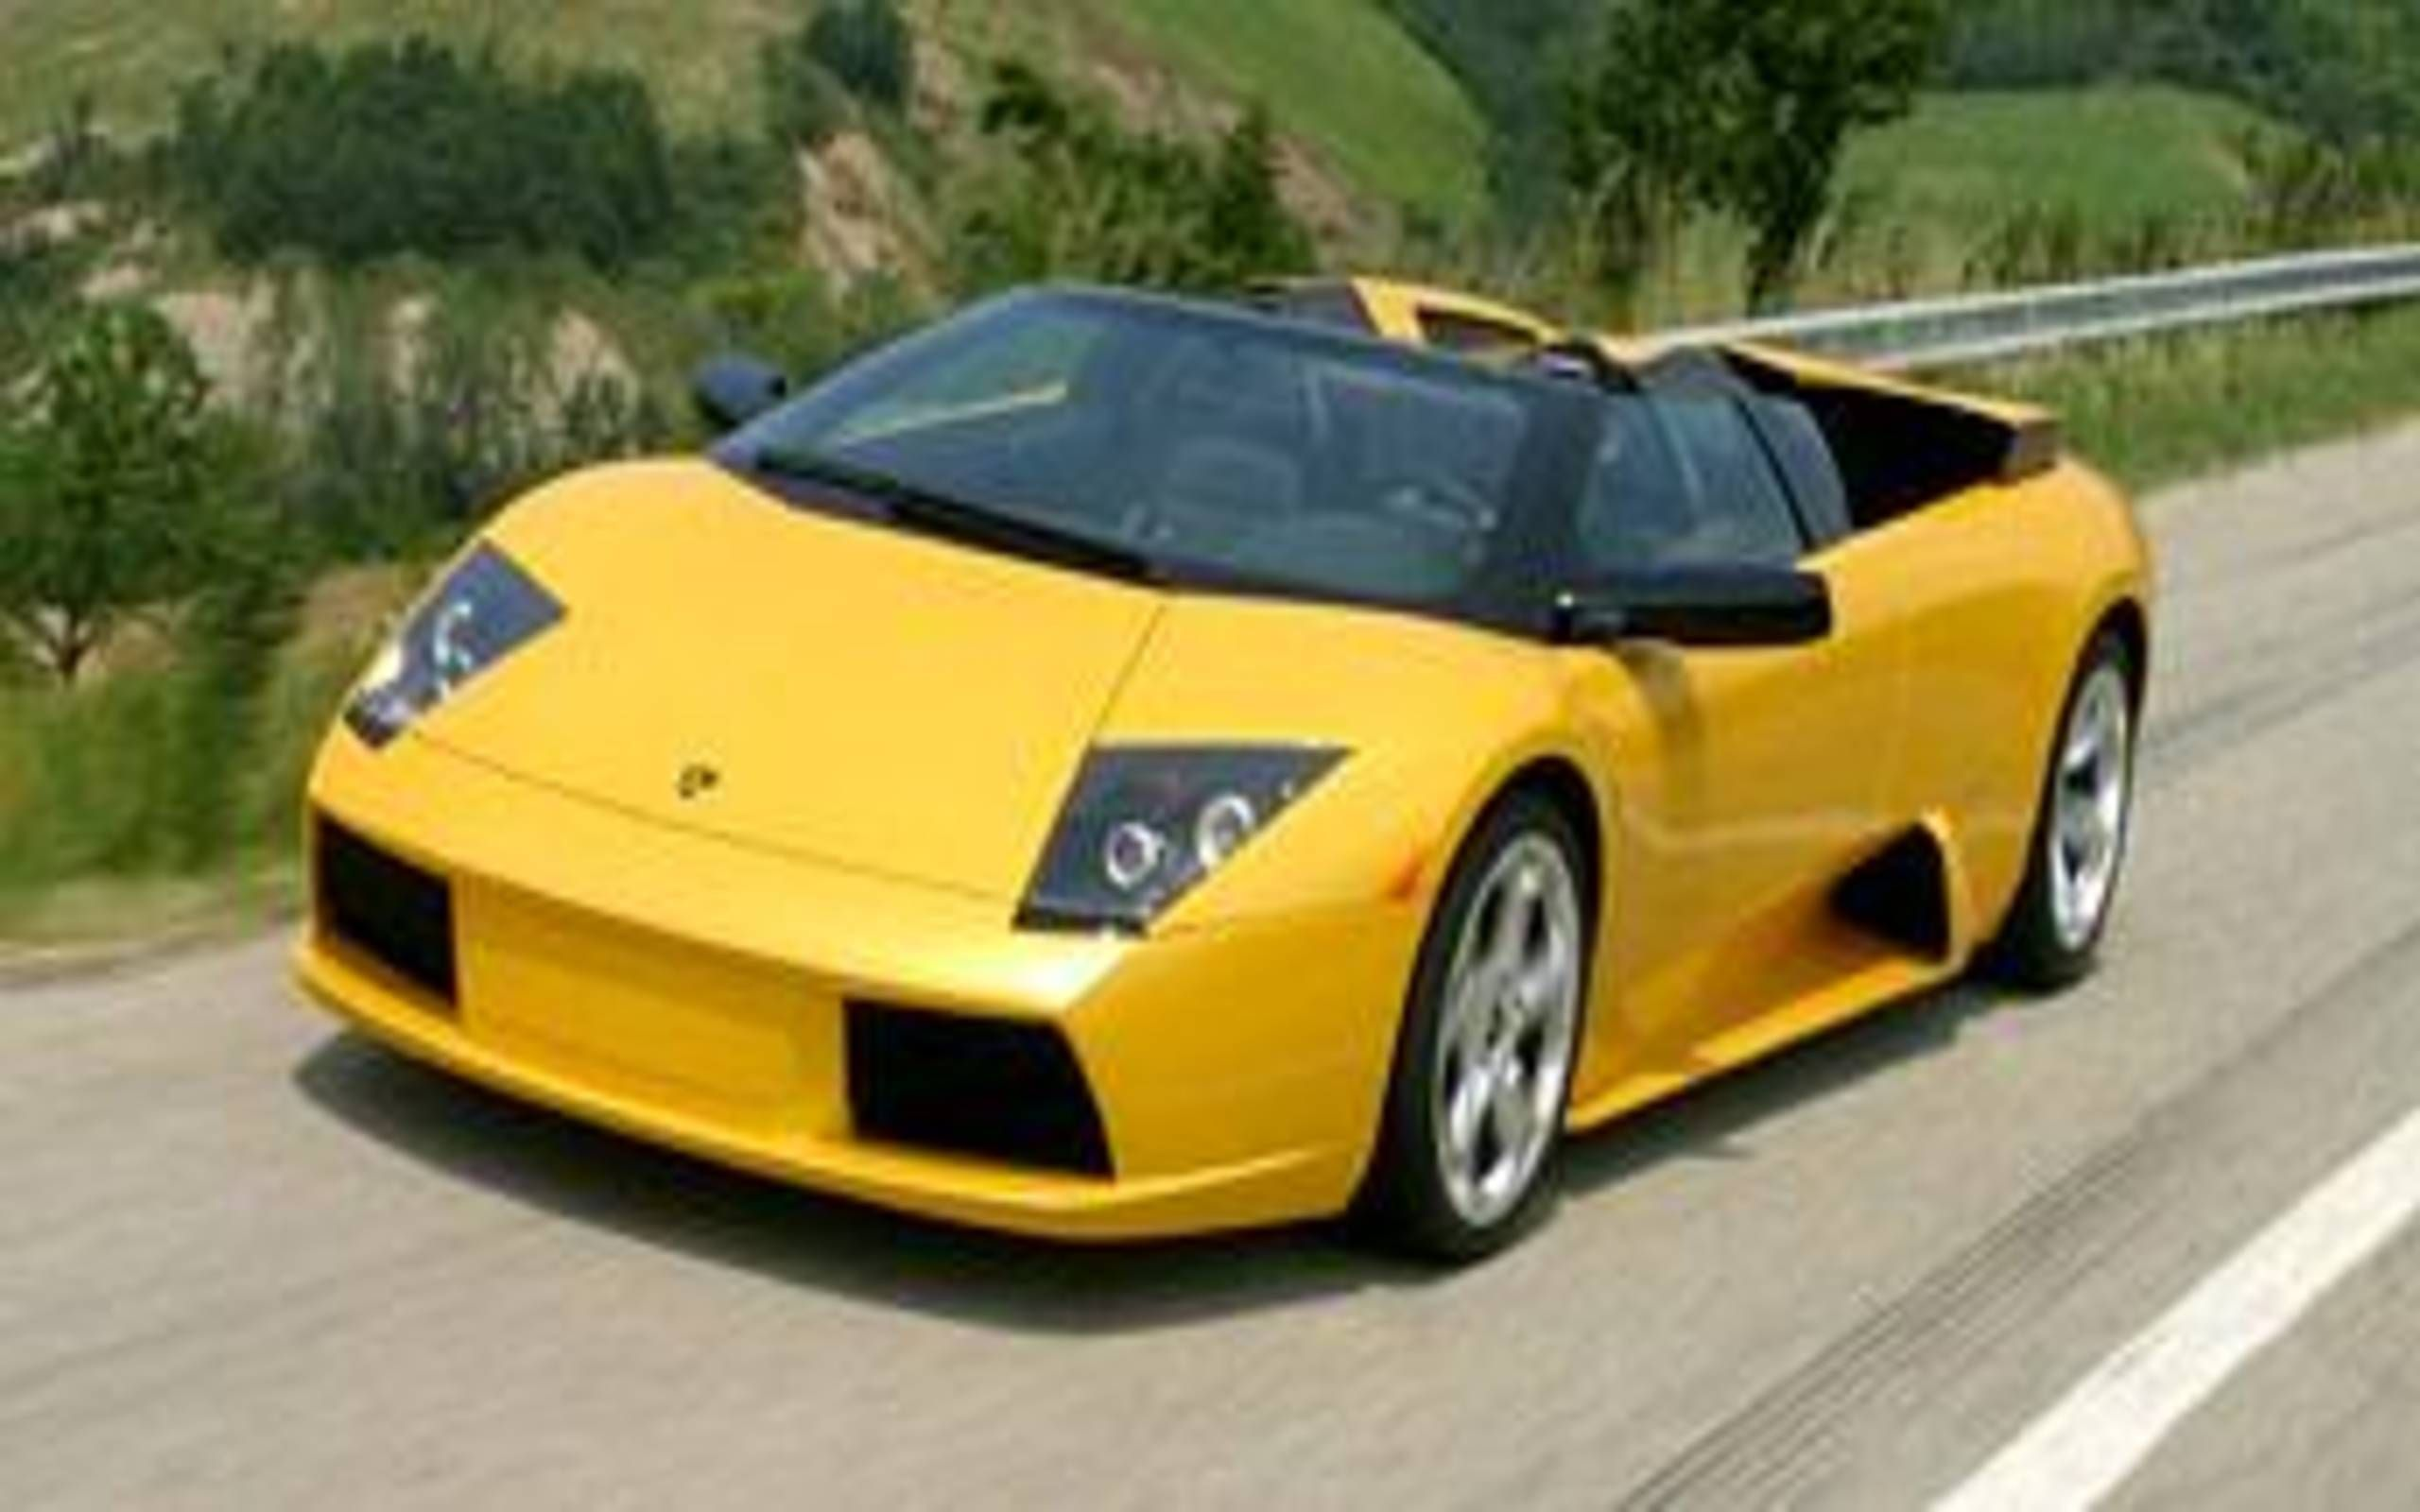 Lamborghini Bull wheel center set of 4 ...2 inch diameter